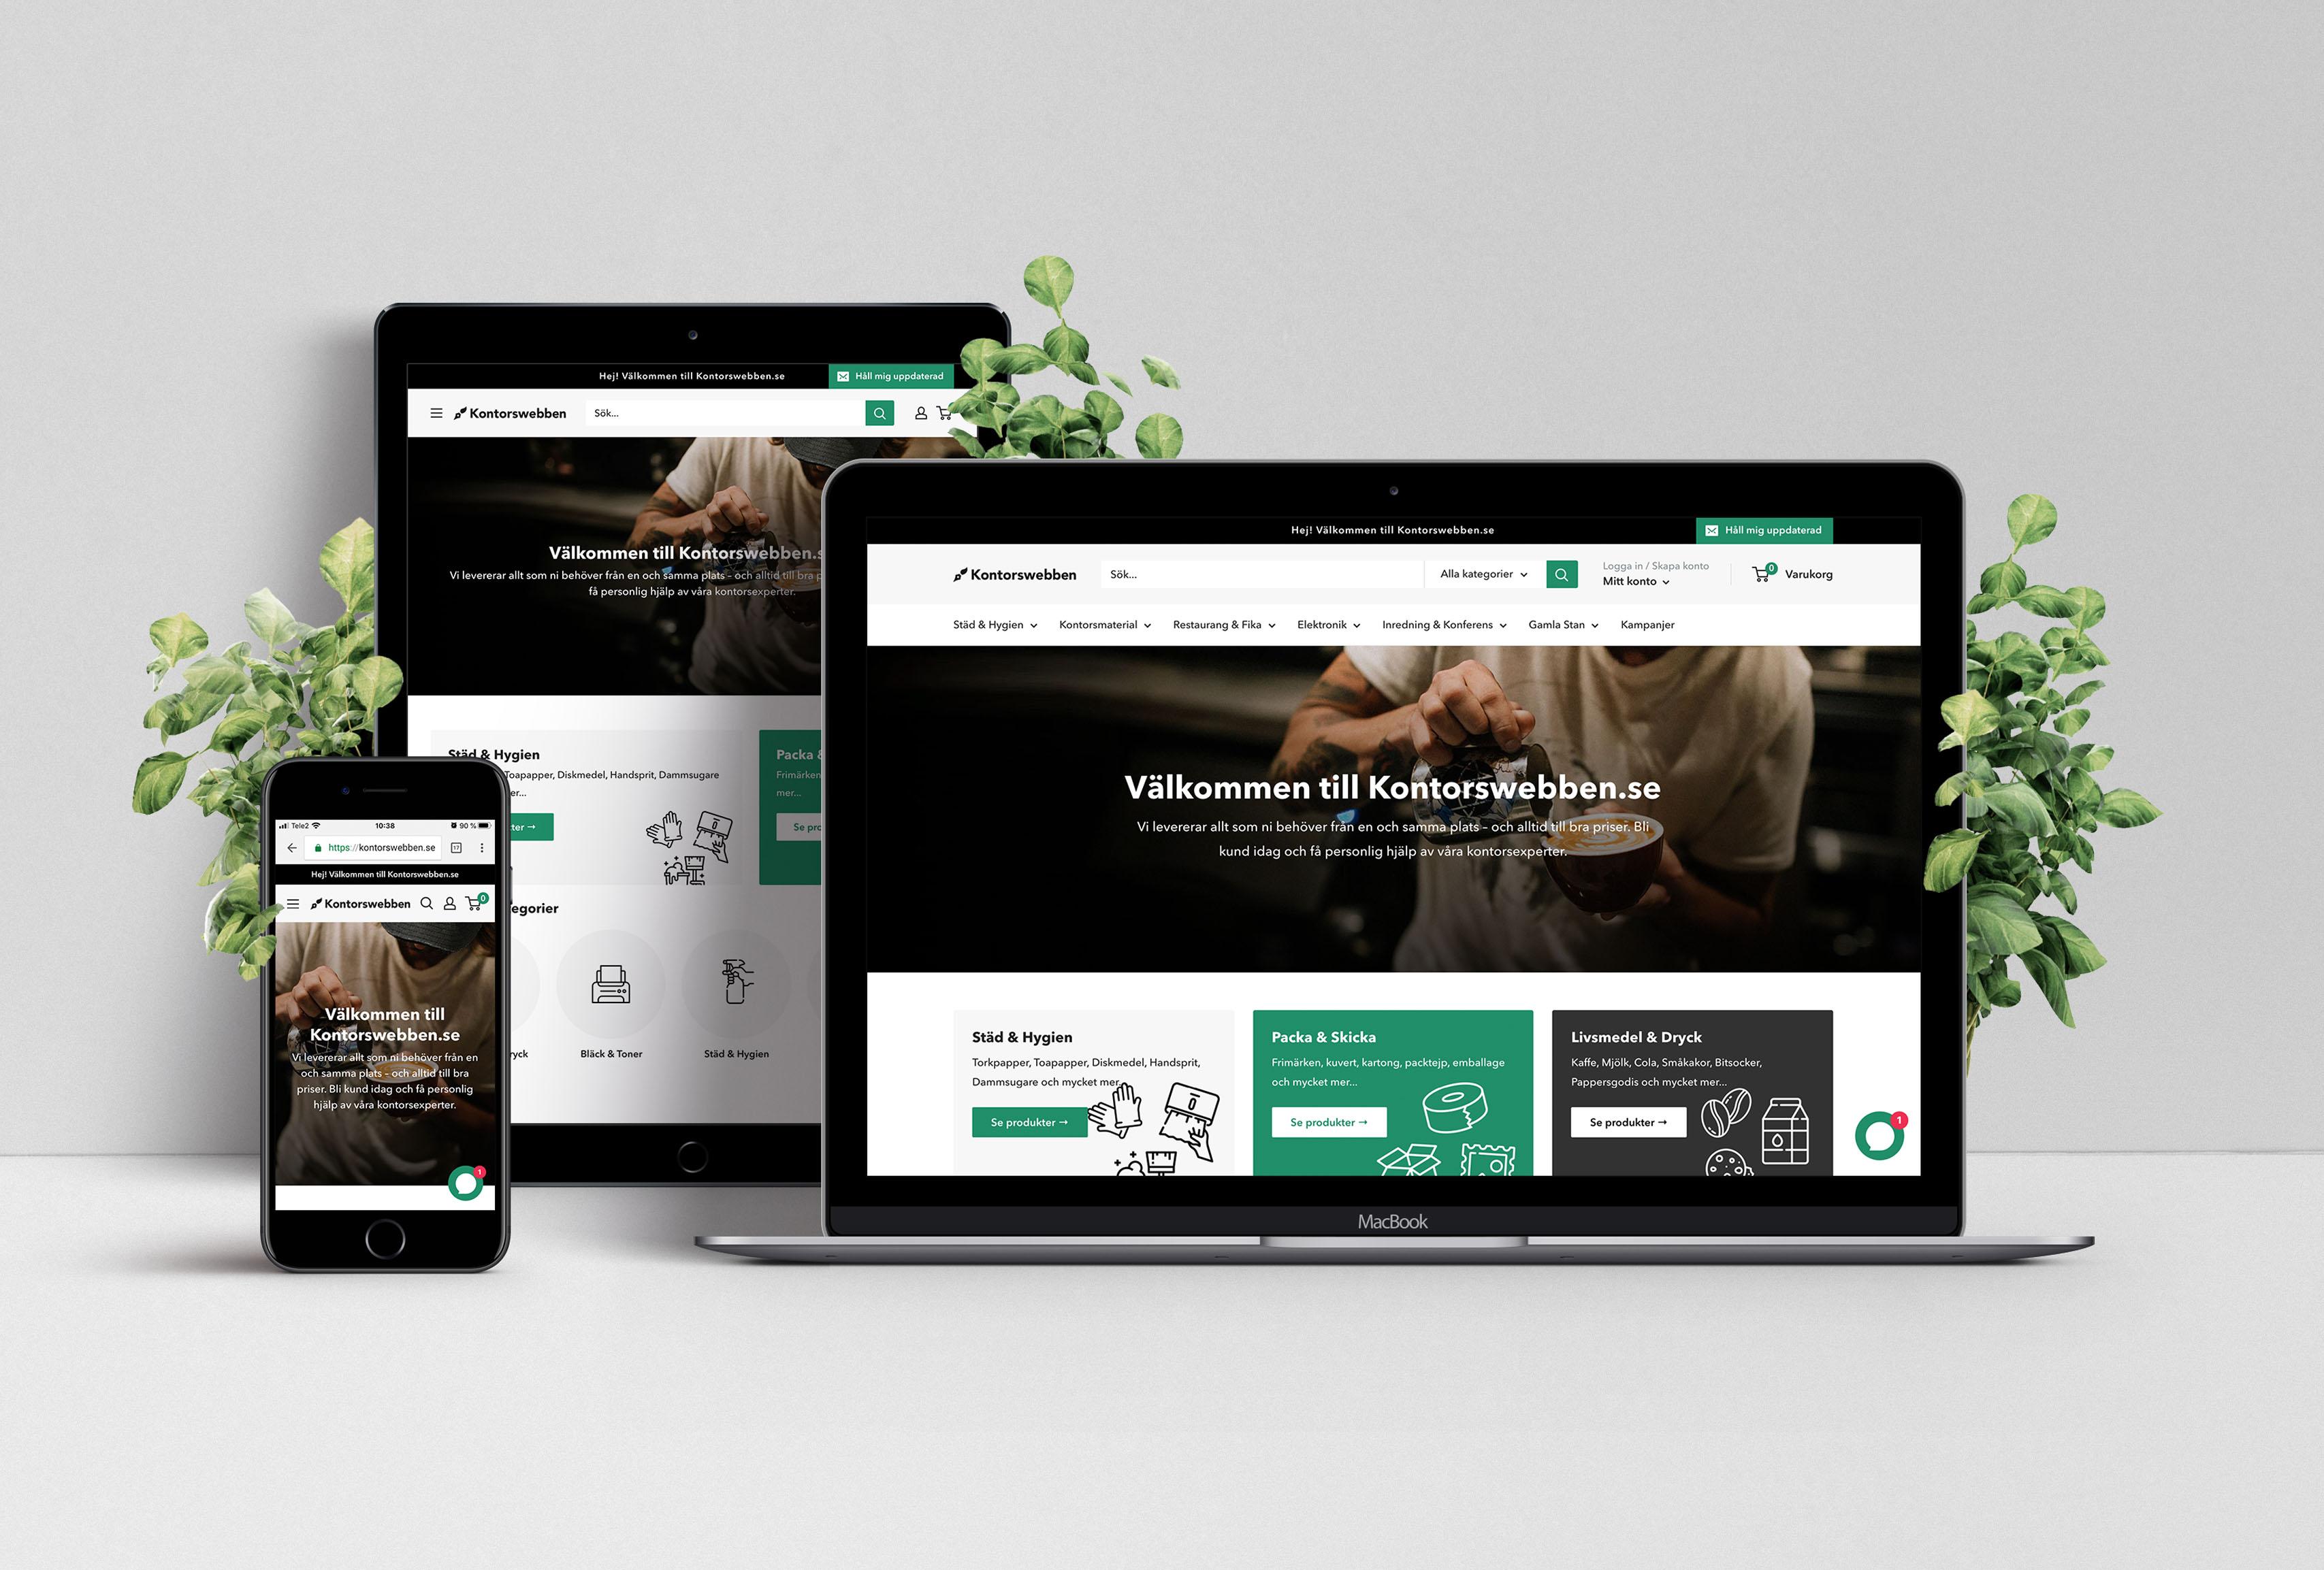 Webbshop & varumärke ~ Kontorswebben.se